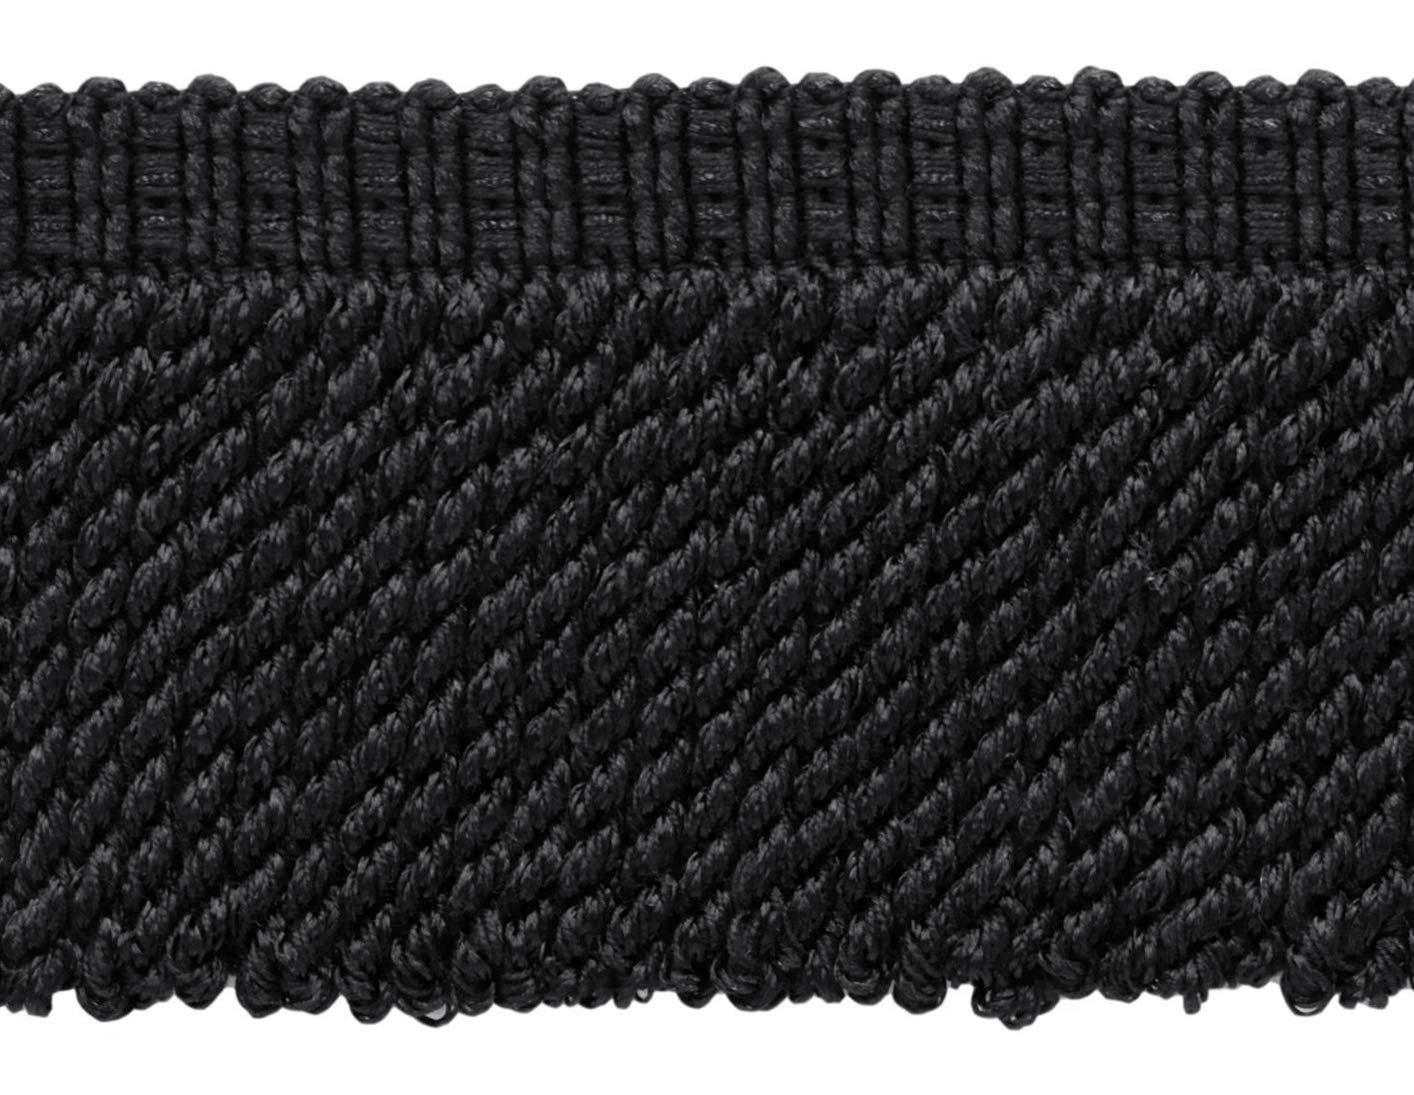 Black 3 Decorative Bullion Fringe Sold by The Yard Style#: BFV3 Color: VNT30 7.5cm Black Charcoal